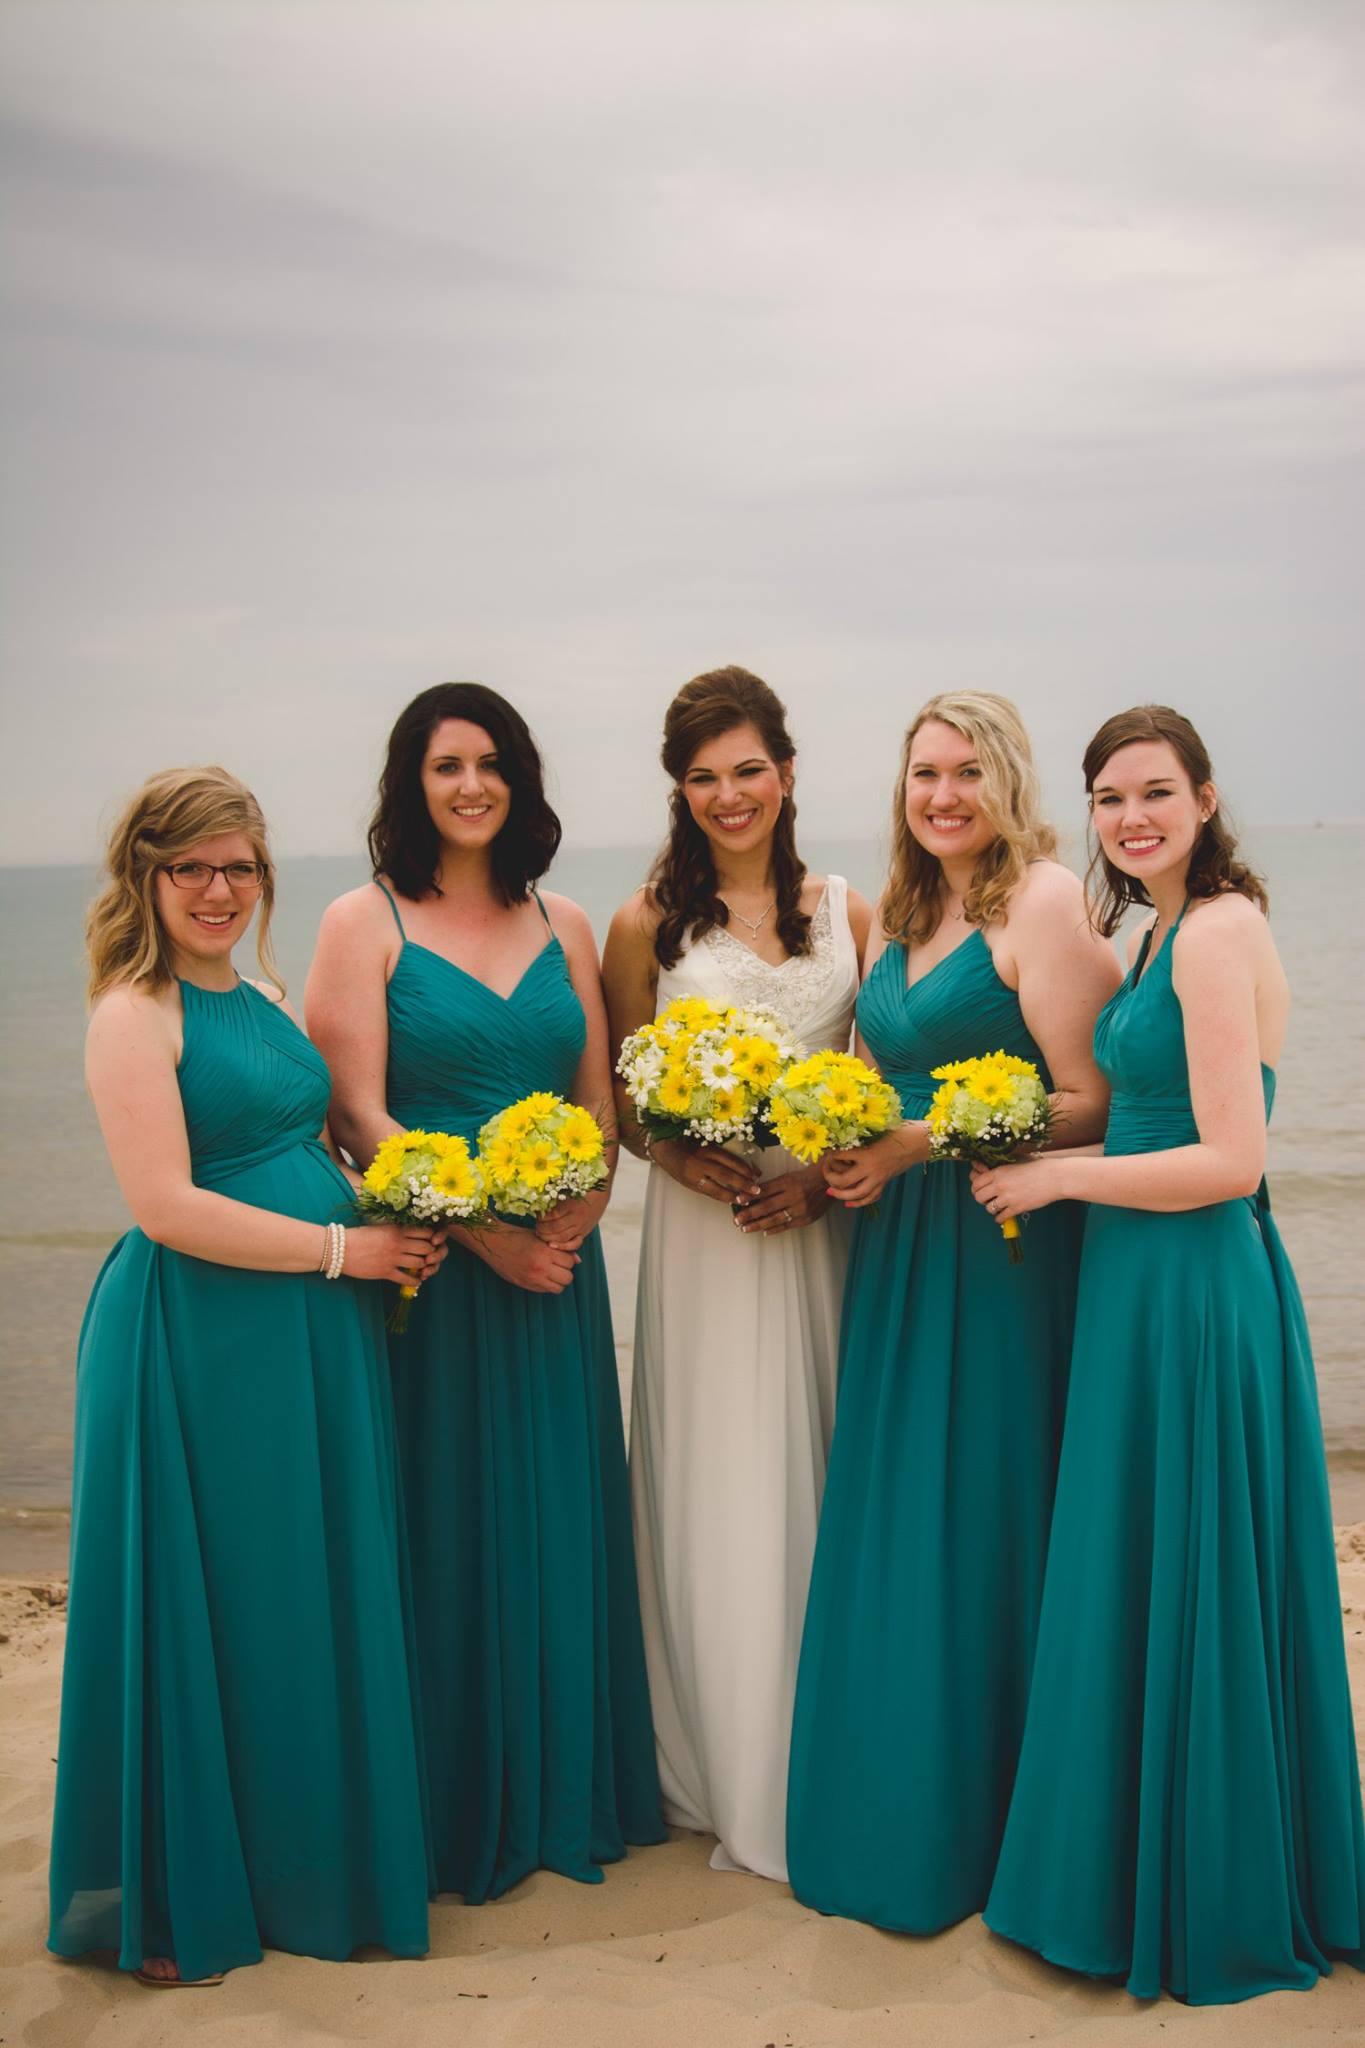 b930af75476 Azazie Haleigh Bridesmaid Dress - Cabernet